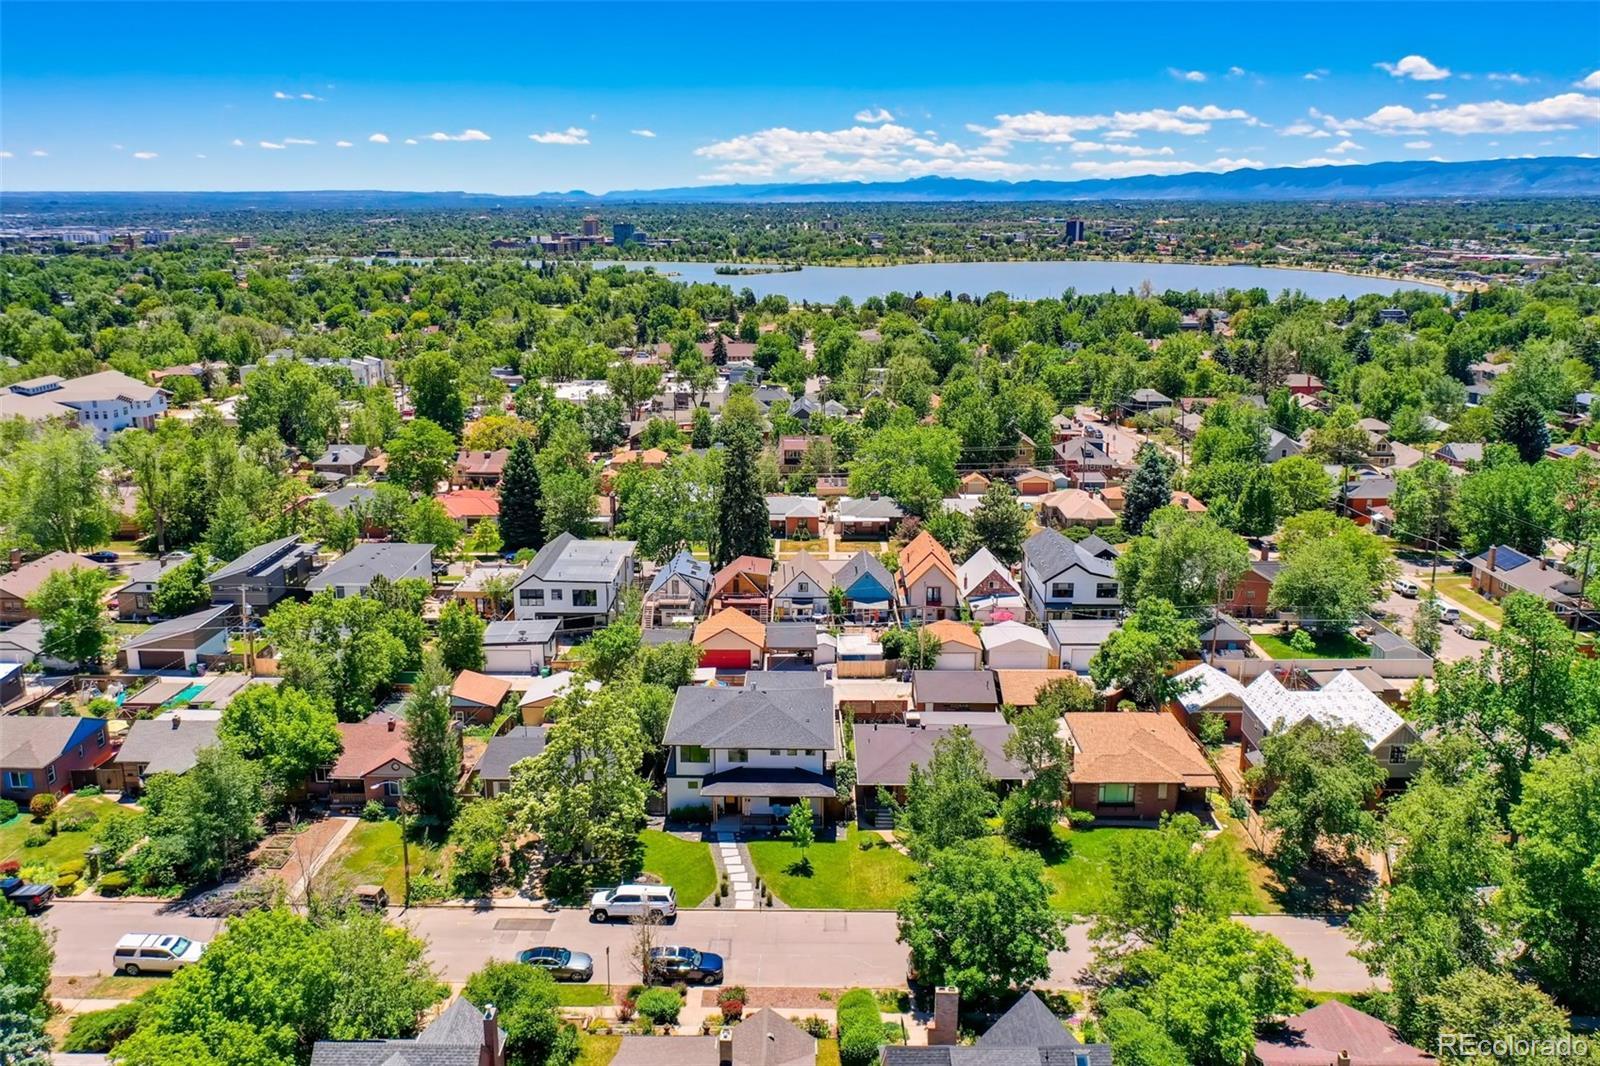 MLS# 6196180 - 34 - 4512 W 31st Avenue, Denver, CO 80212